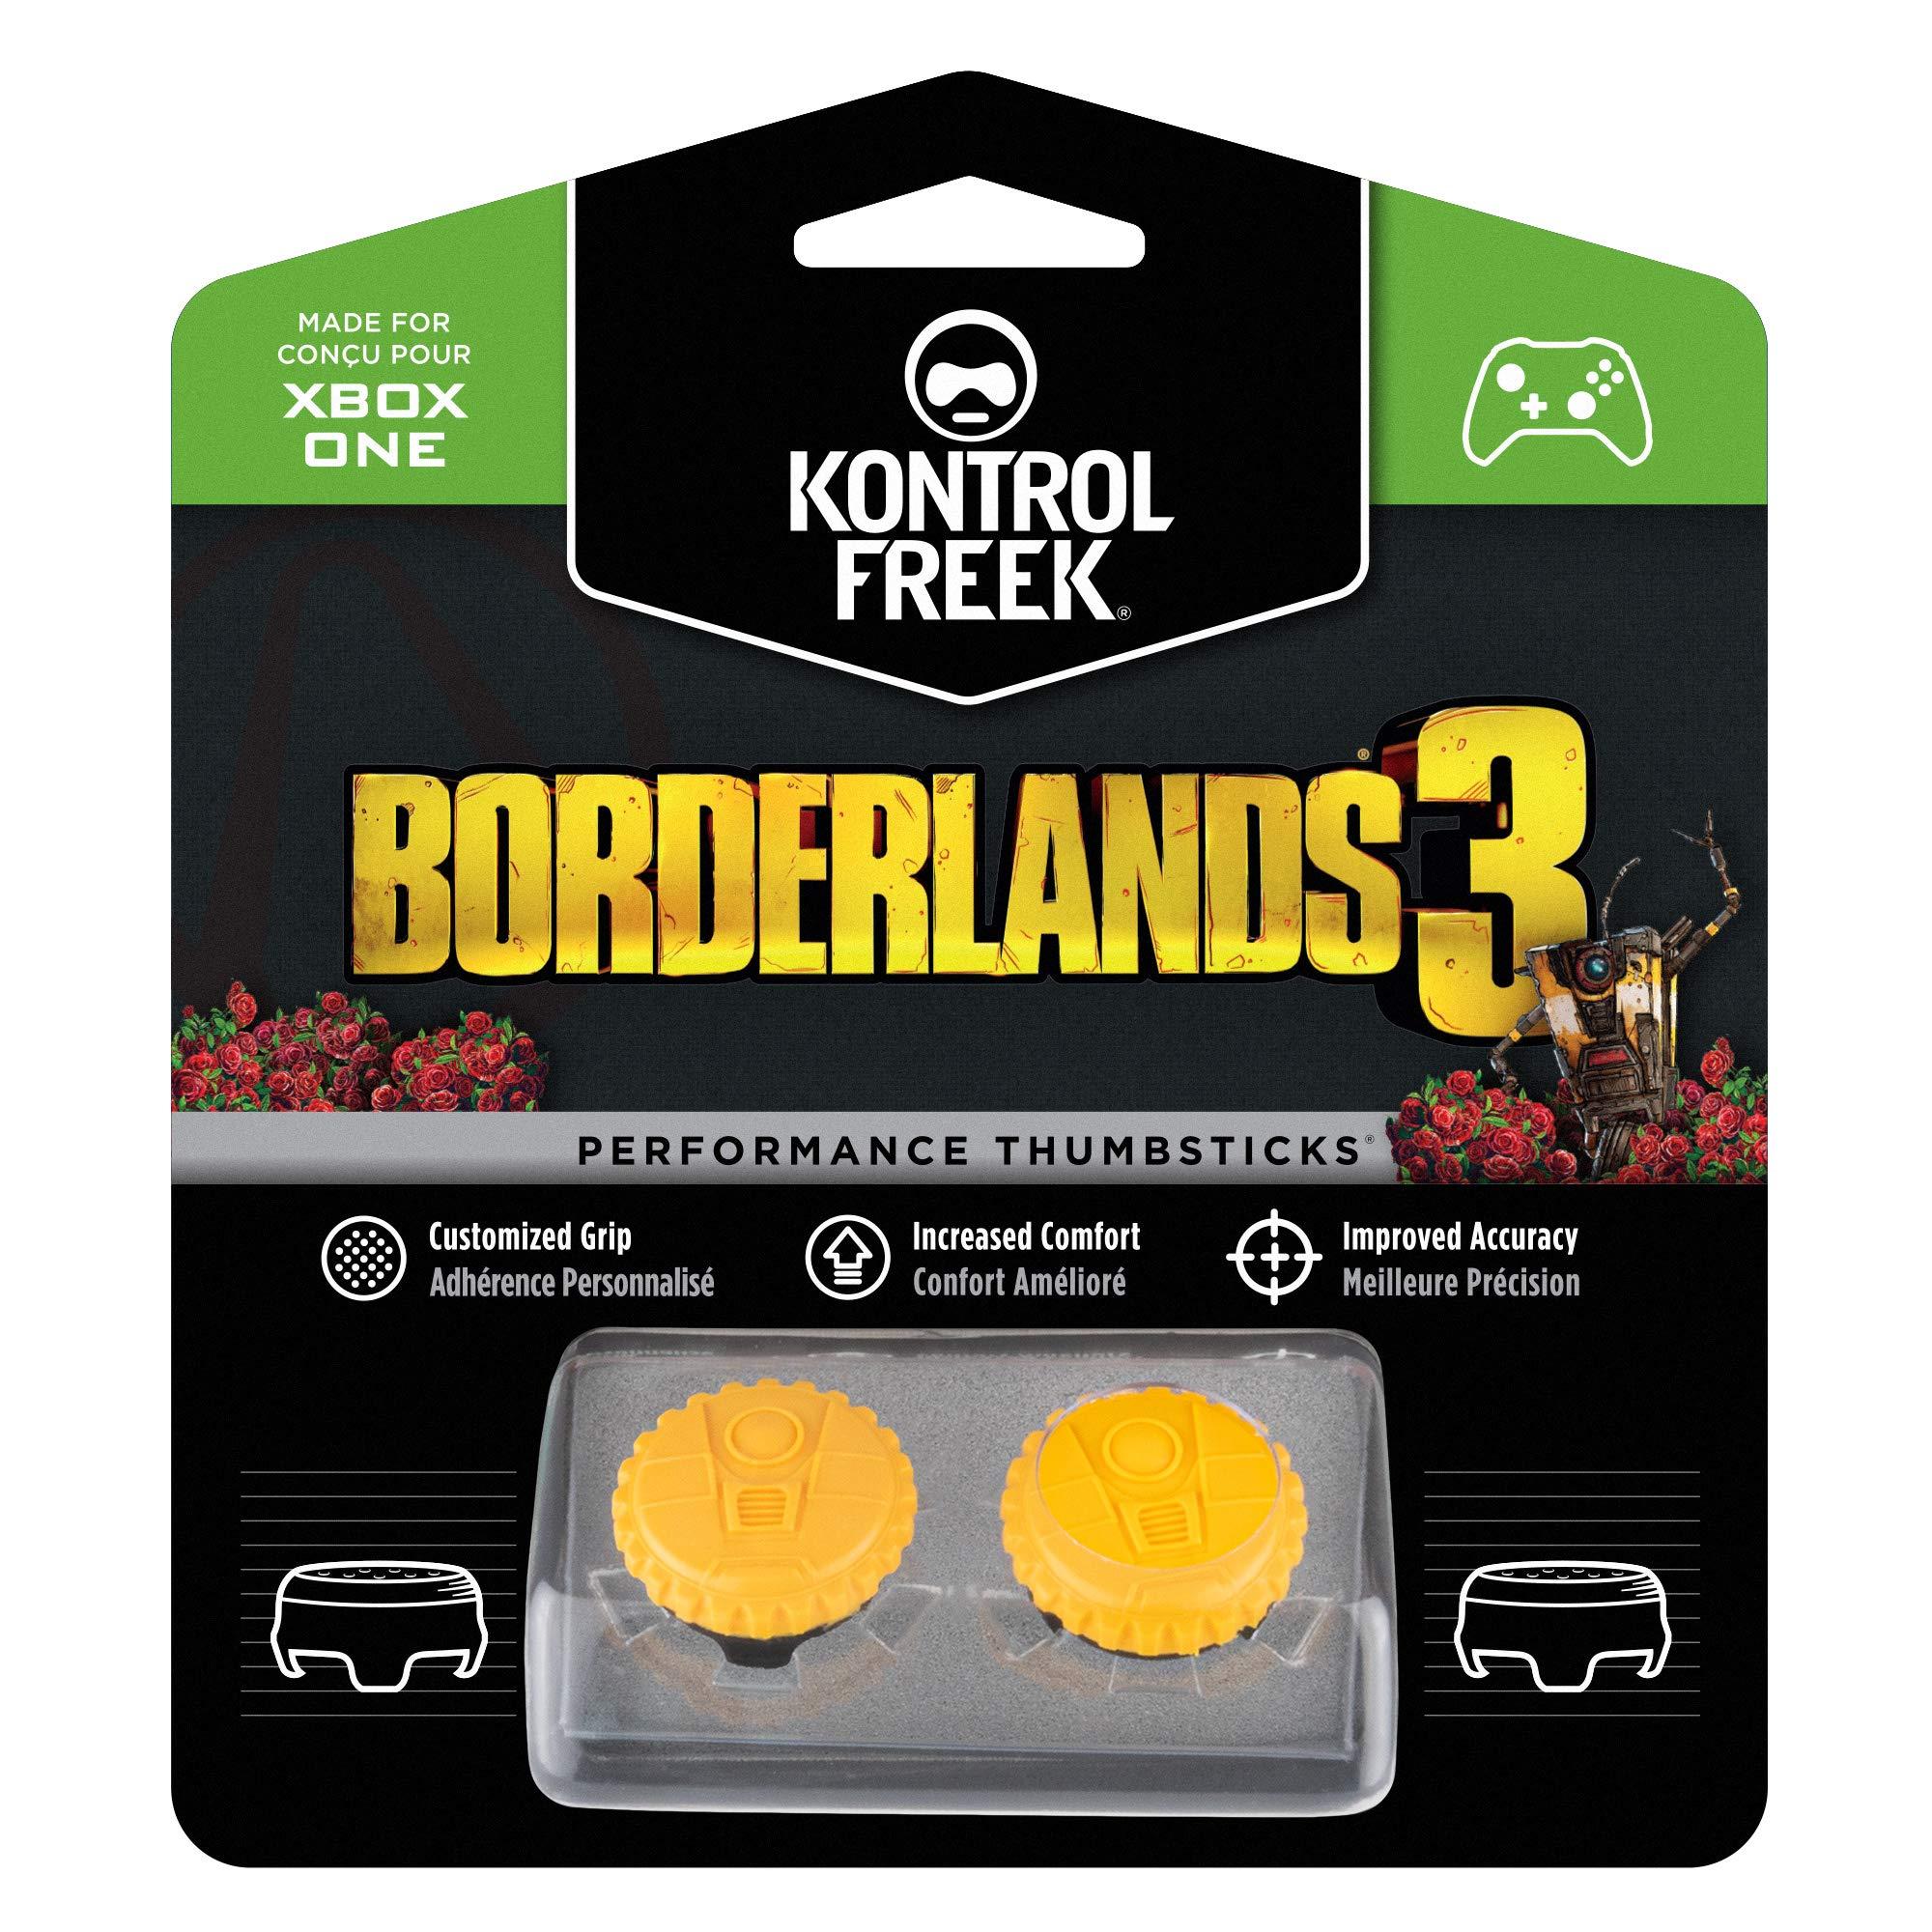 KontrolFreek Borderlands® 3 Claptrap Performance Thumbsticks for Xbox One | 2 Mid-Rise Convex Thumbsticks | Yellow by KontrolFreek